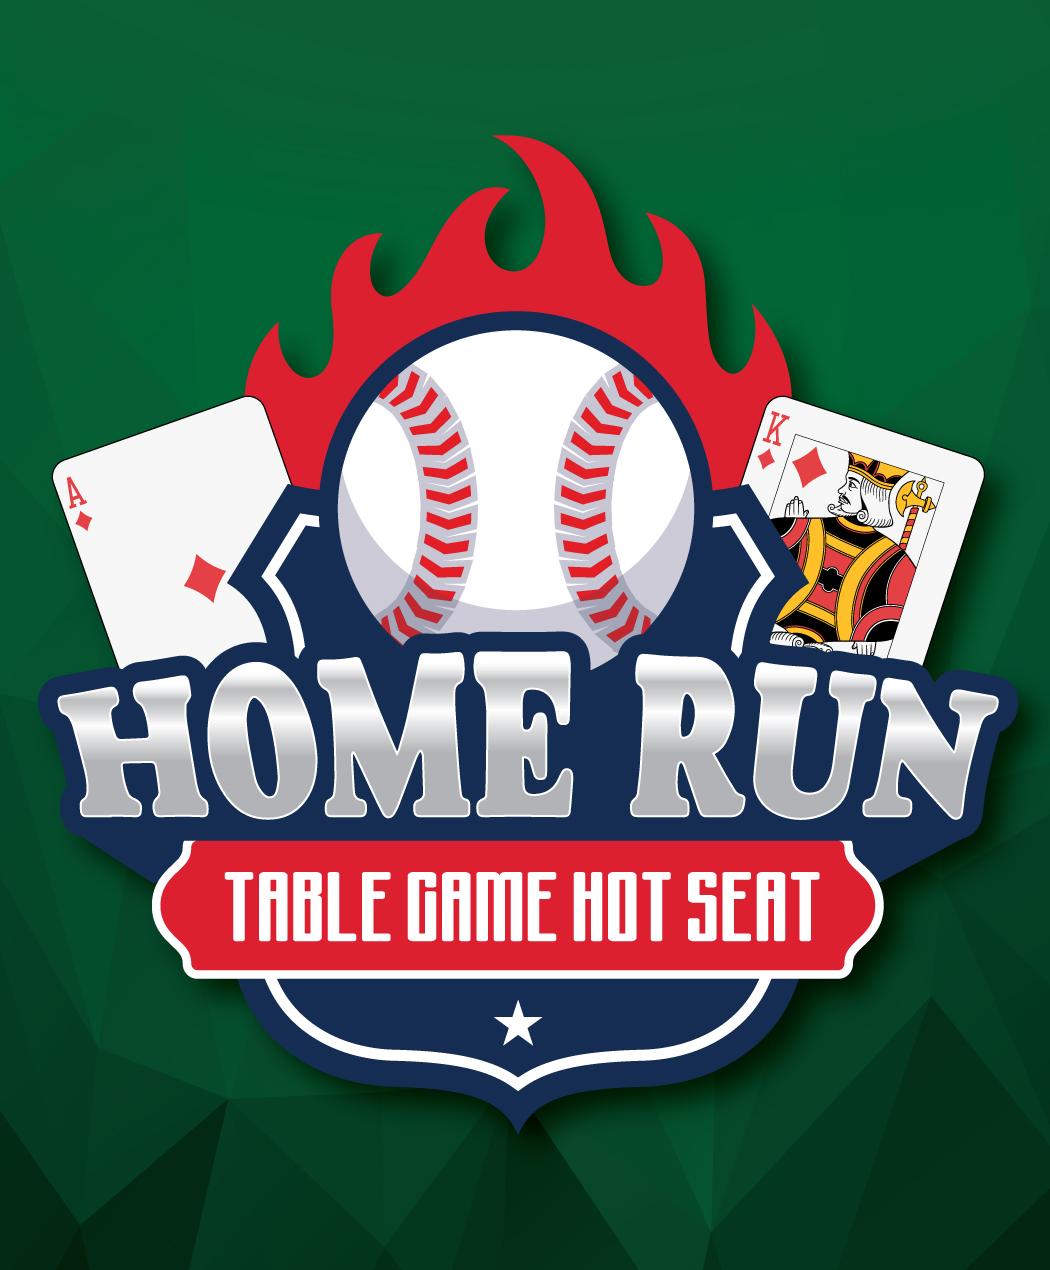 Home Run Hot Seat